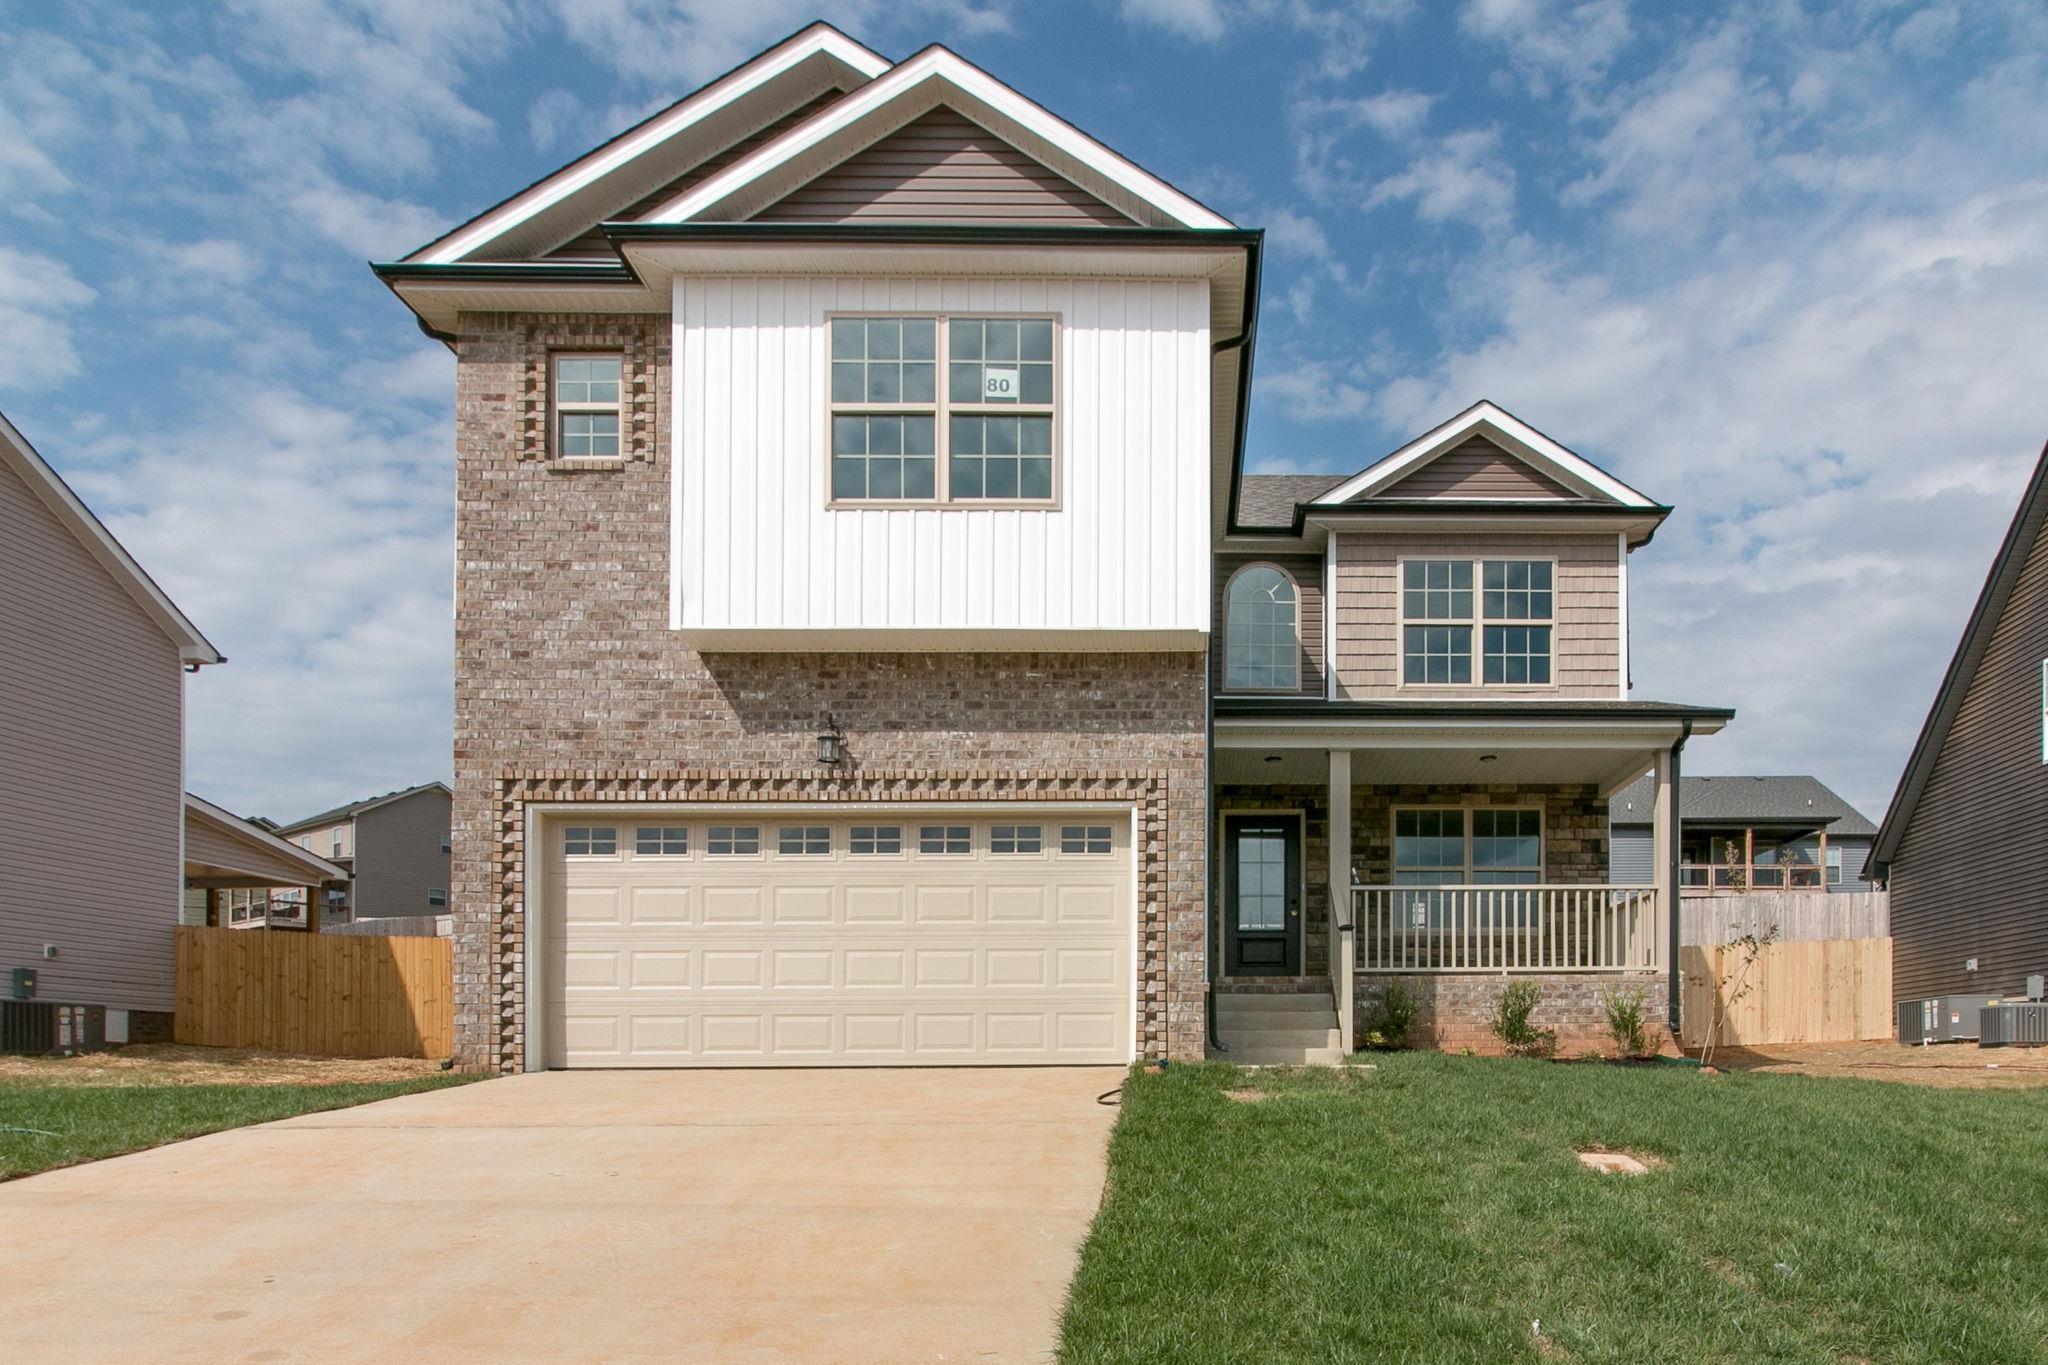 835 Crestone Ln (Lot 80), Clarksville, TN 37042 - Clarksville, TN real estate listing